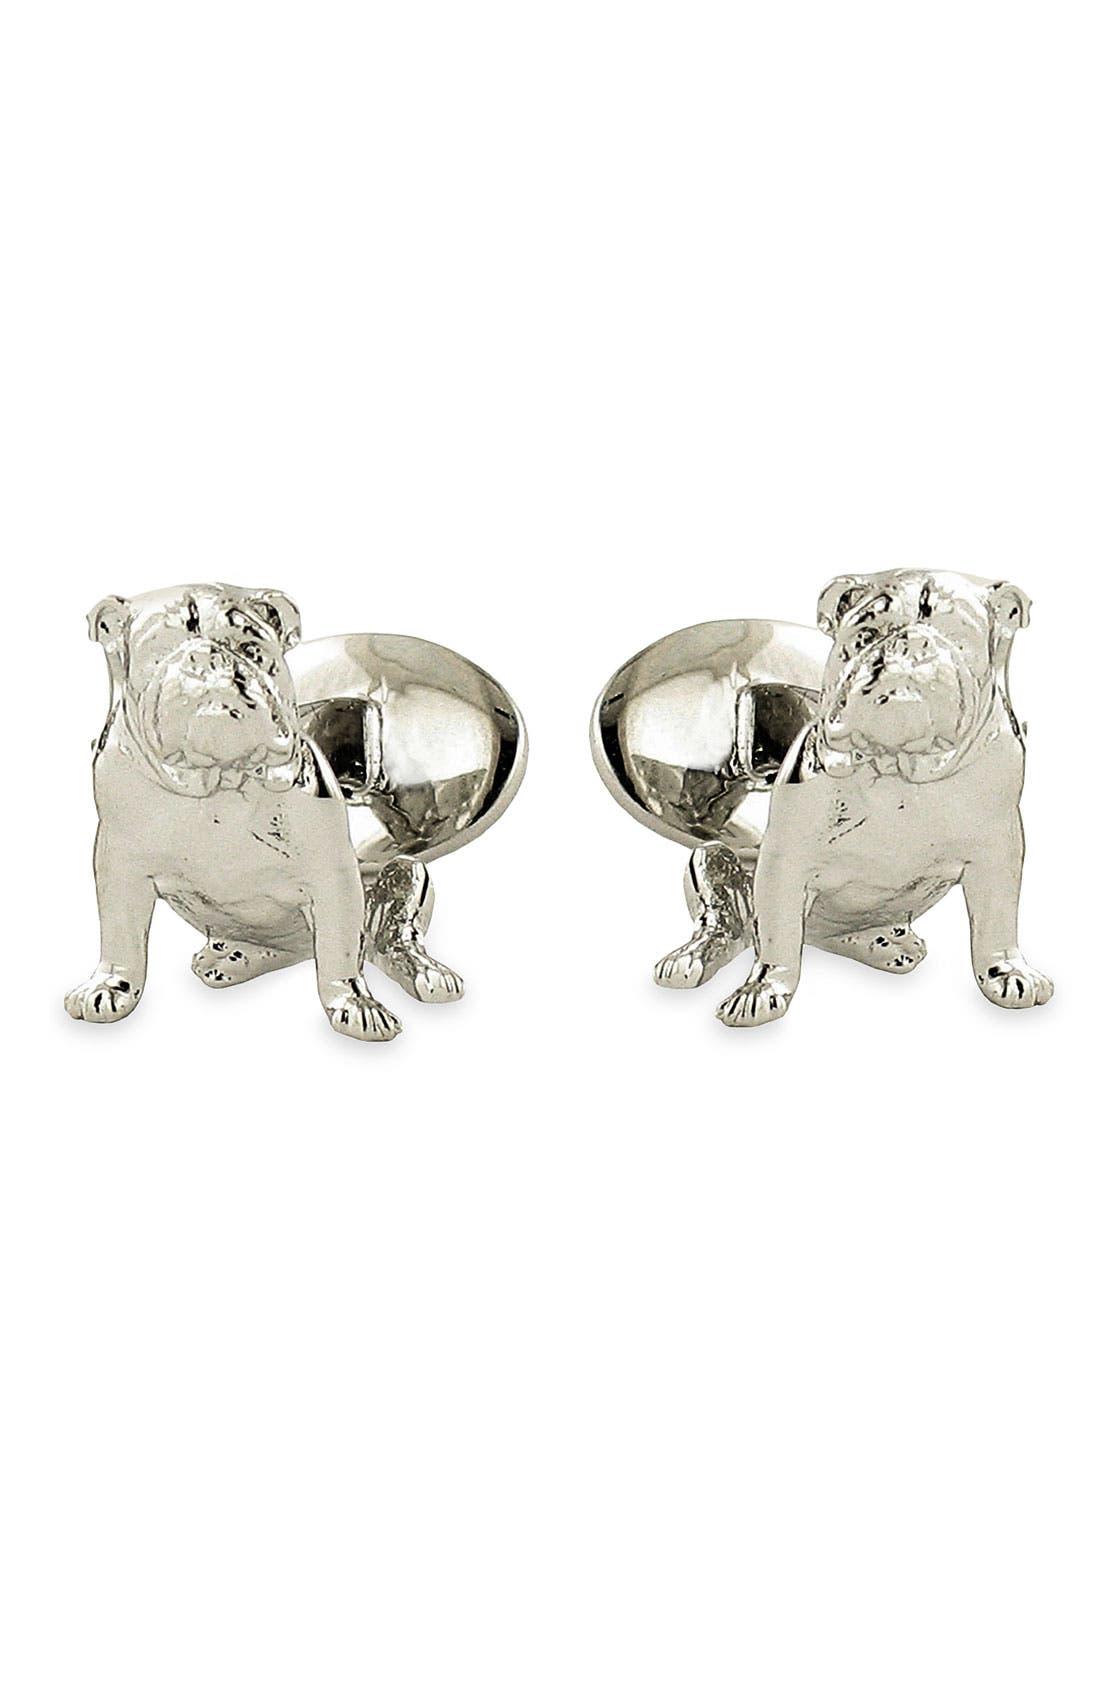 David Donahue 'Bulldog' Sterling Silver Cuff Links